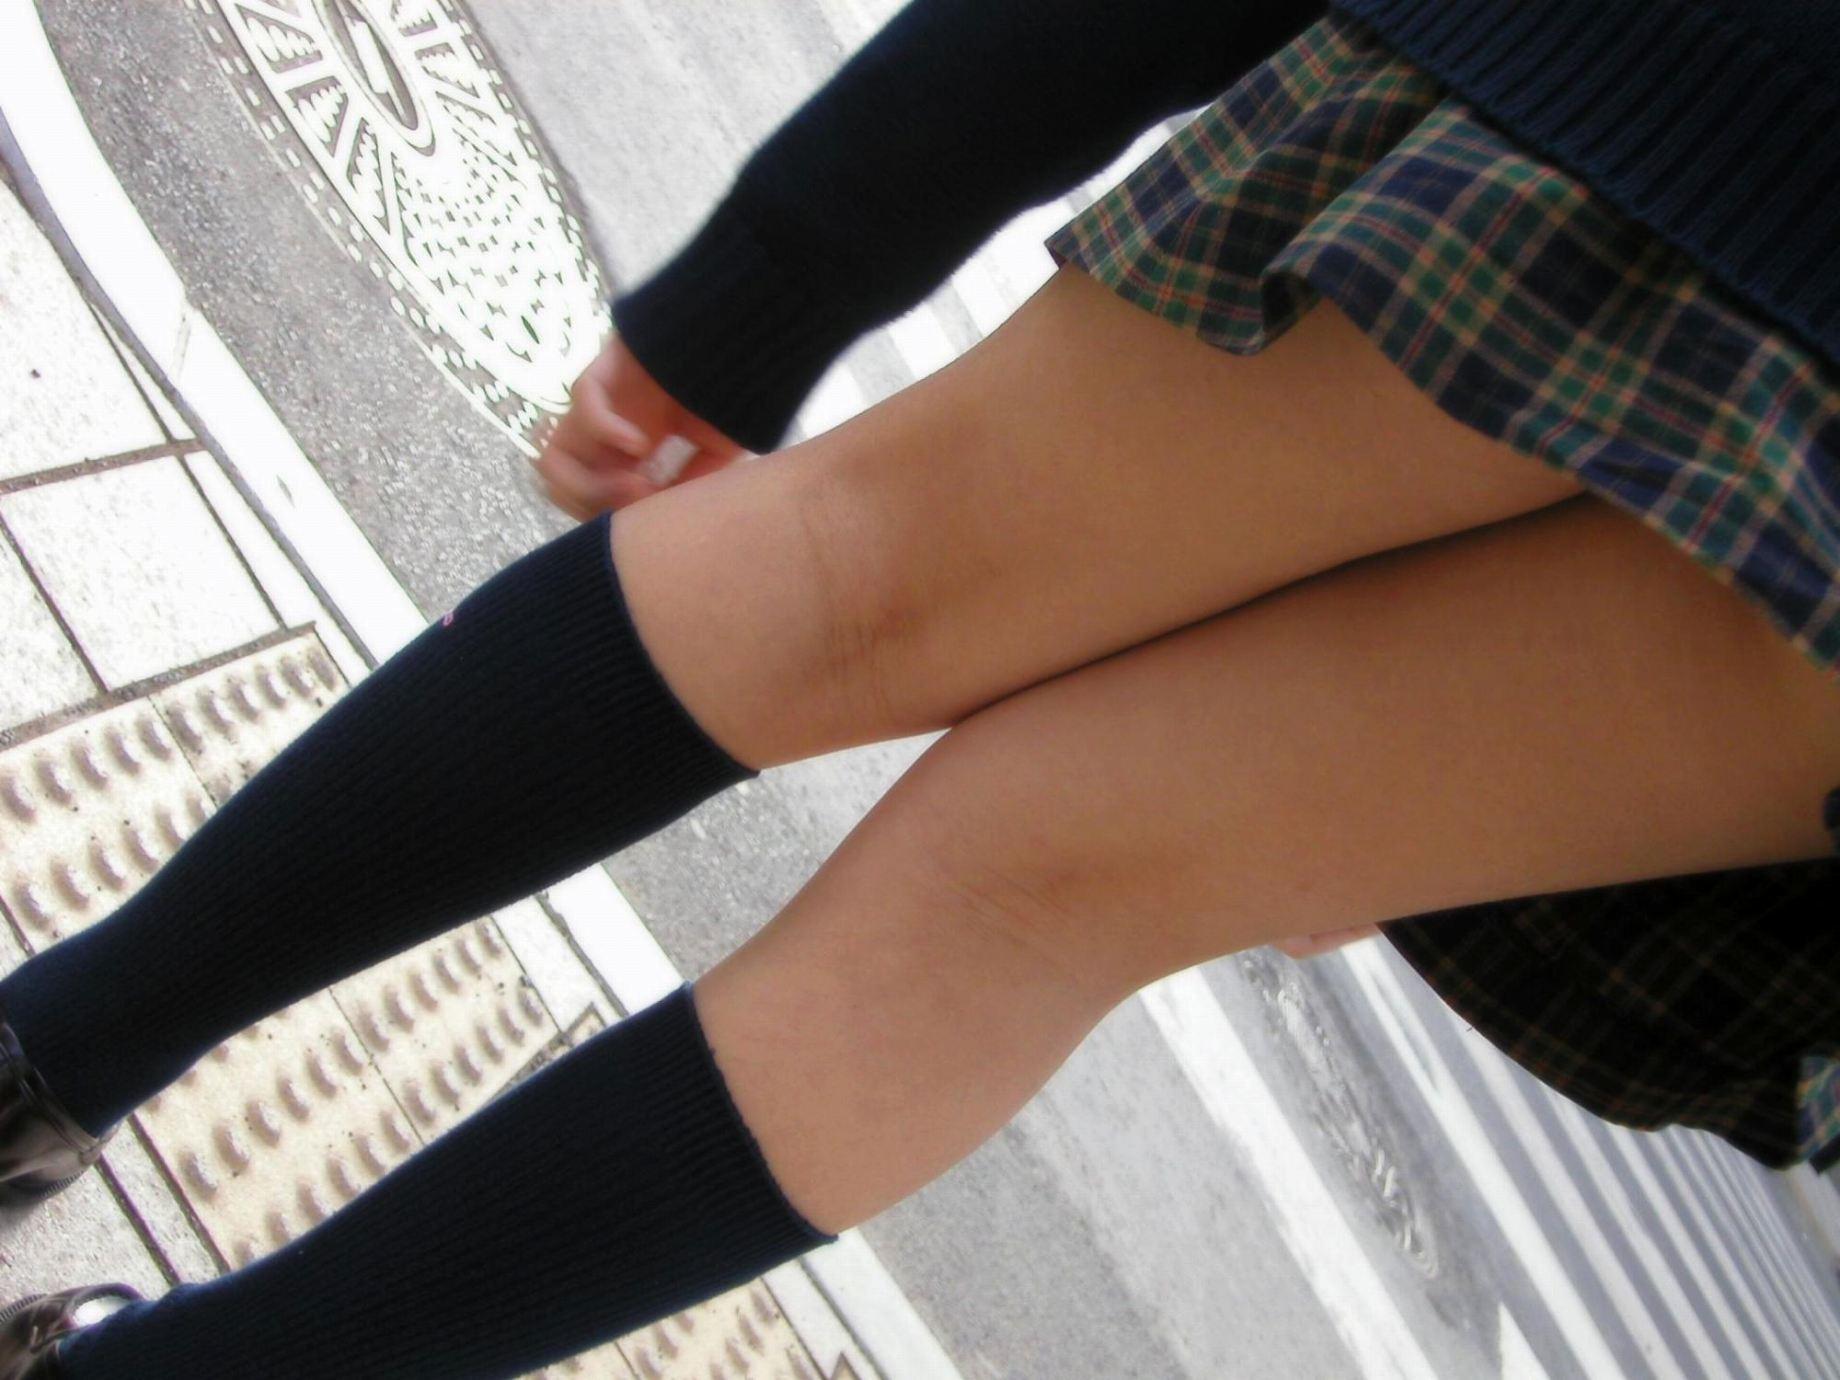 【JK街撮り】JK達の健康的にムチムチした太股に萌える画像 09